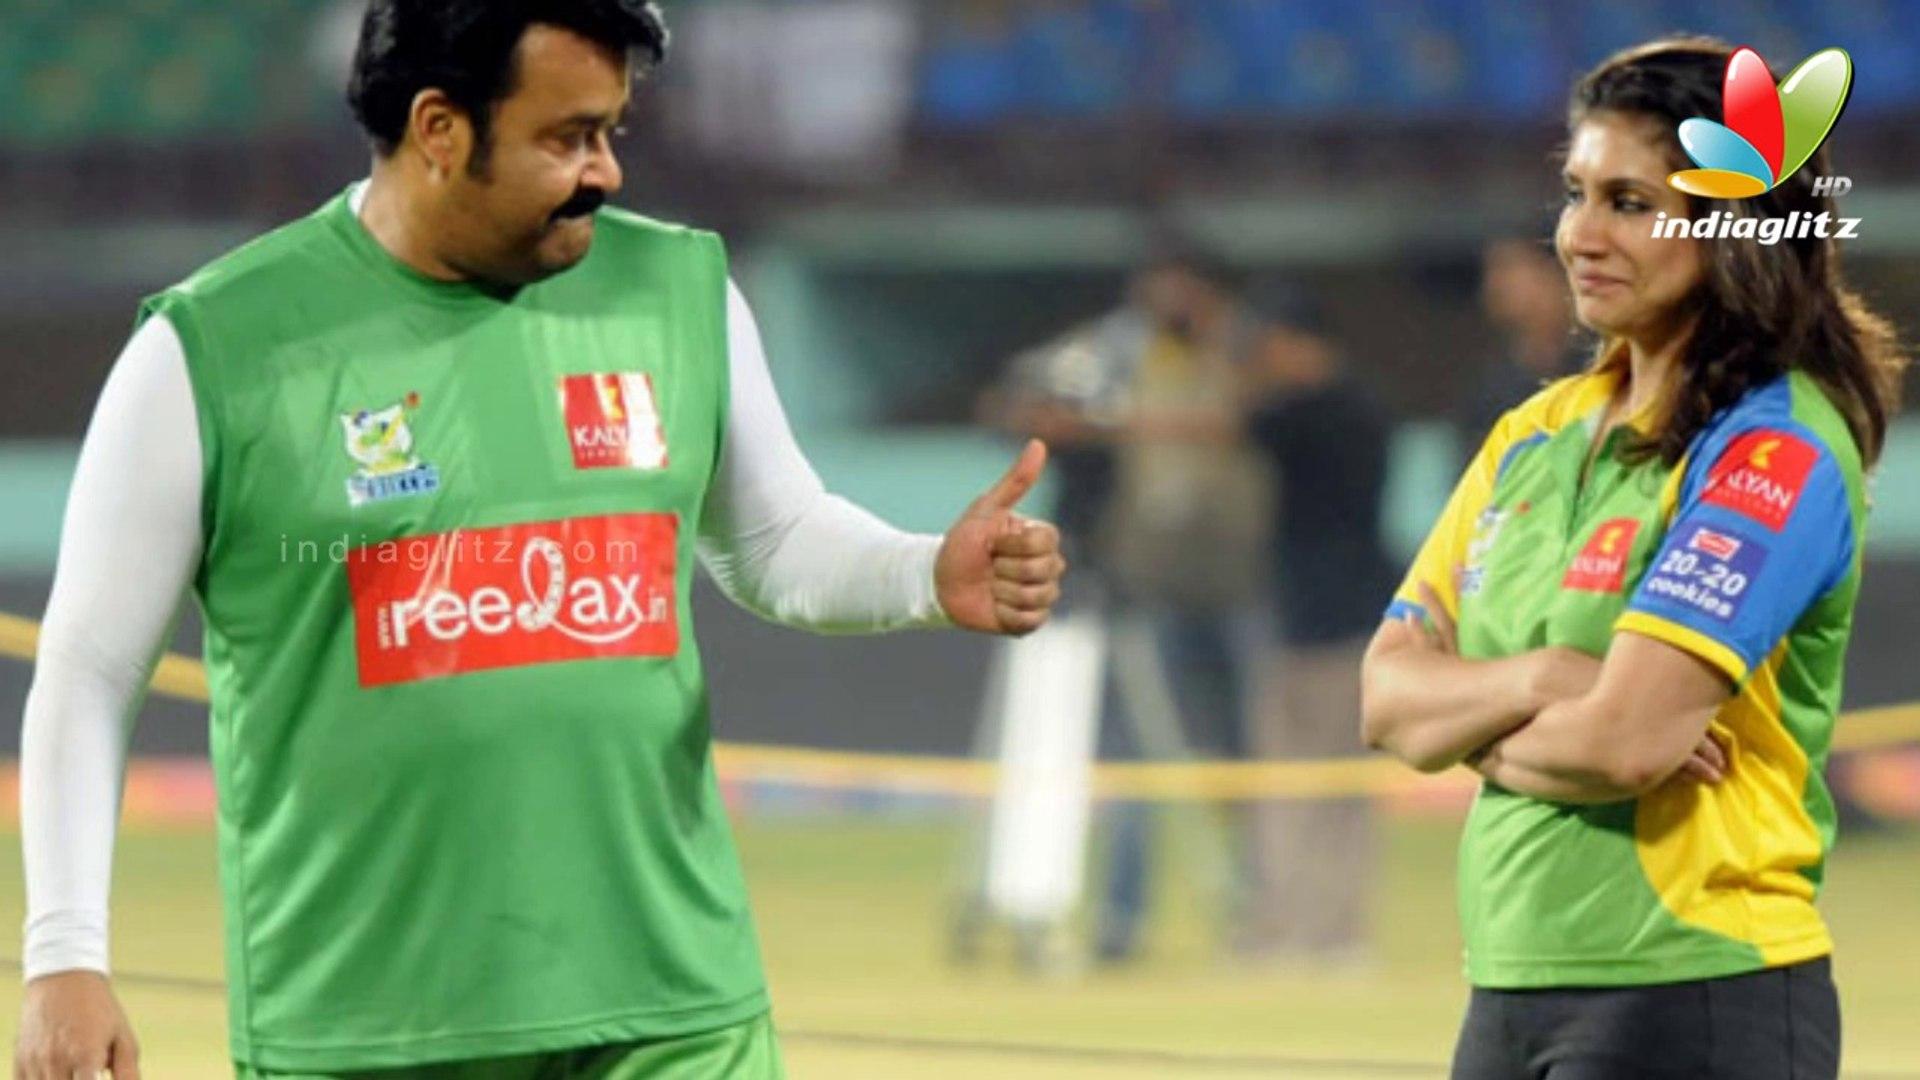 Priyadarshan, Lissy Headed For Splitsville? I Latest Hot Malayalam News | Malayalam Movies